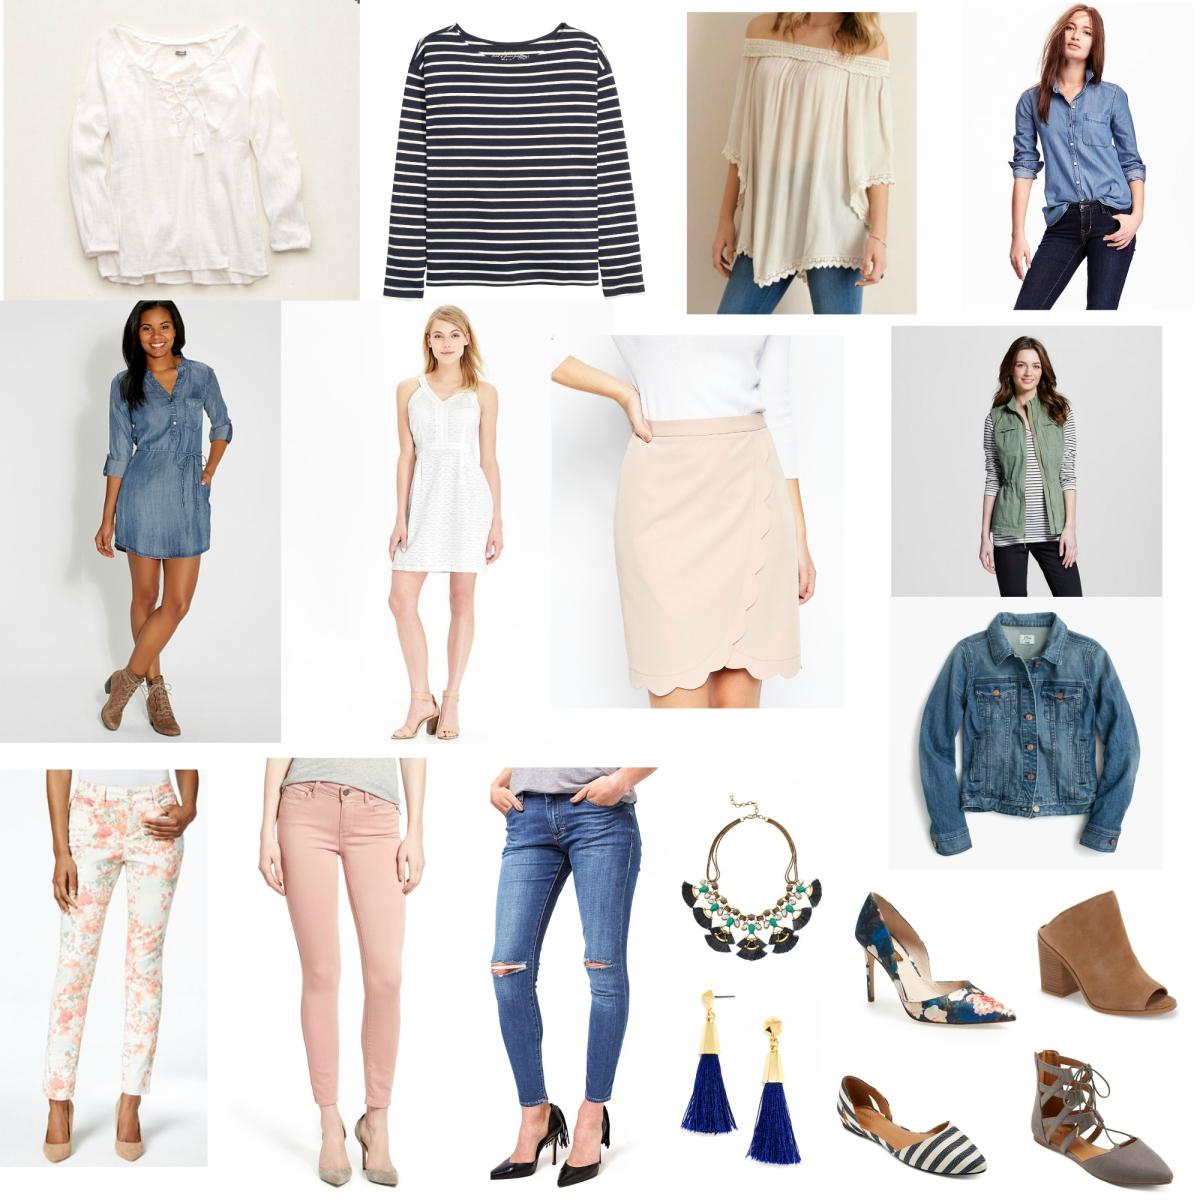 Spring 2016 Wardrobe Essentials |www.pearlsandsportsbras.com|